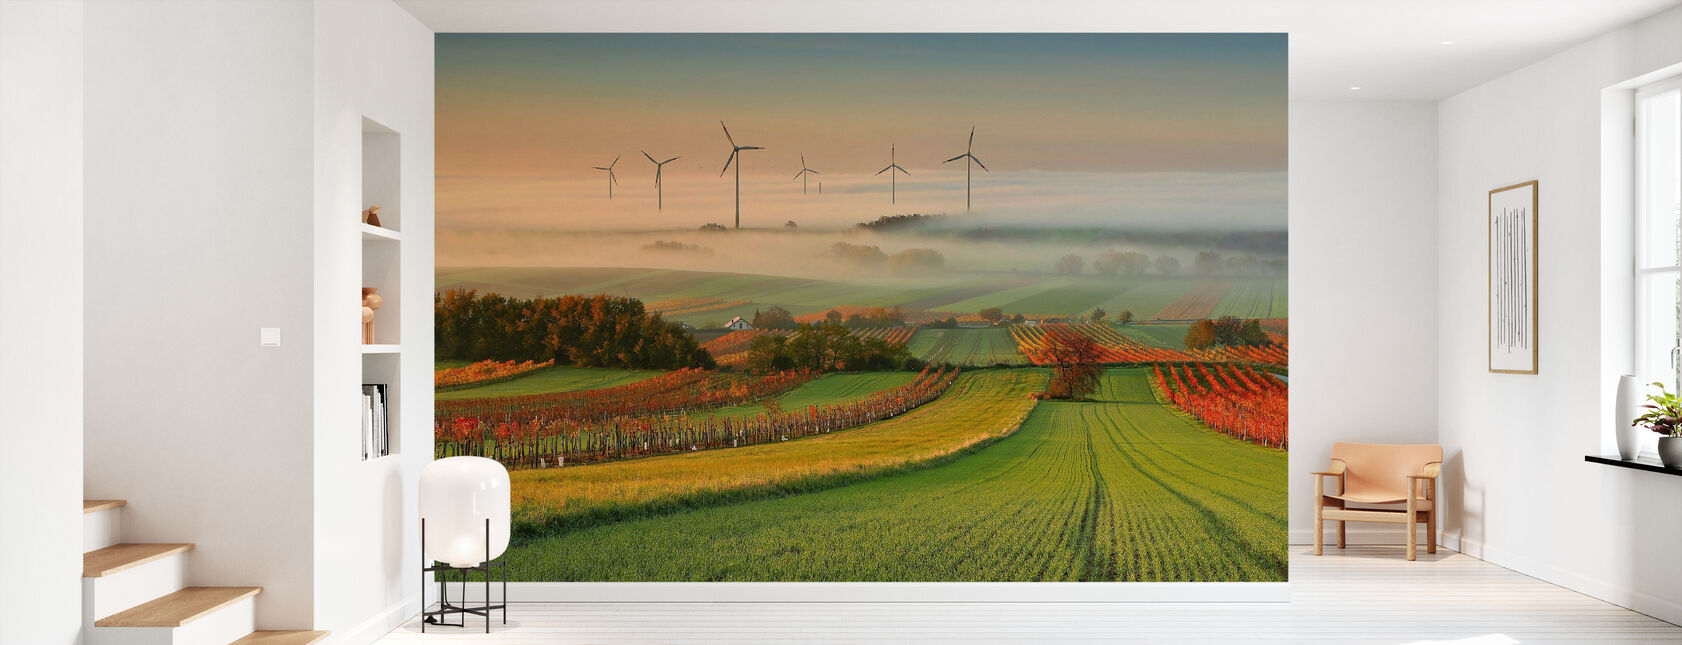 Autumn Atmosphere in Vineyards - Wallpaper - Hallway